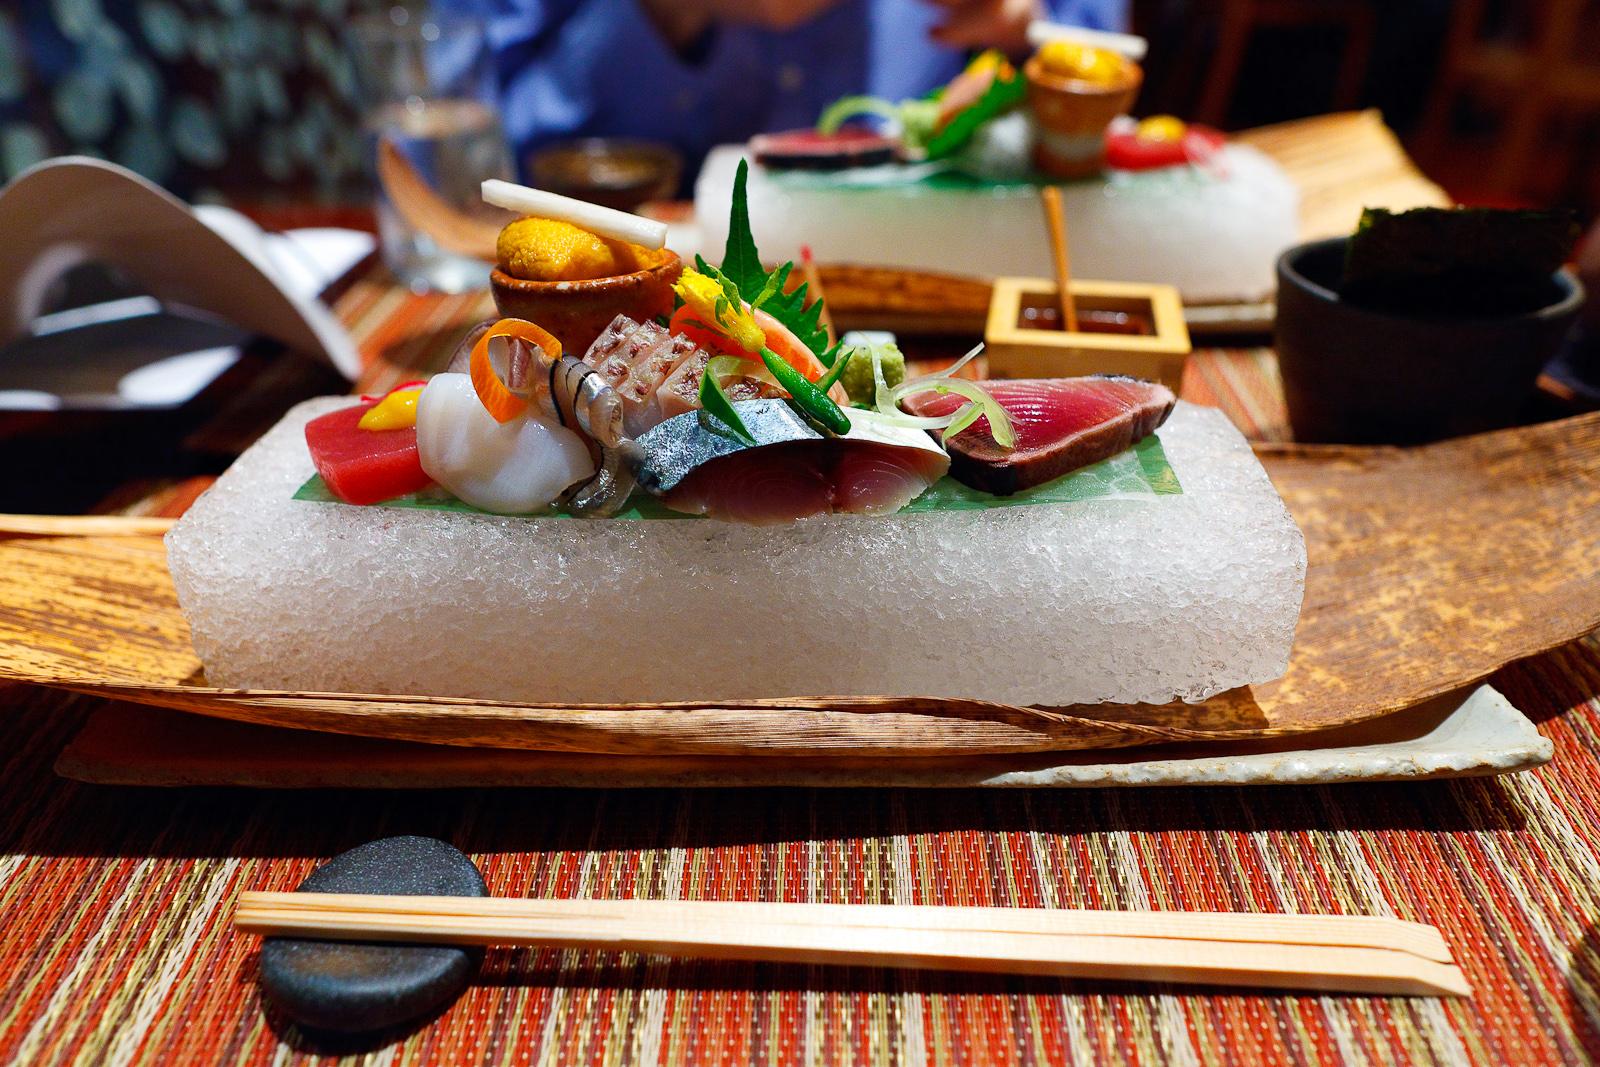 Assorted sashimi - Bonito seared with straw, marinated mackerel, Tasmanian salmon trout, kibinago (baby herring), Japanese snapper, sea urchin, fresh Hokkaido octopus, lean tuna